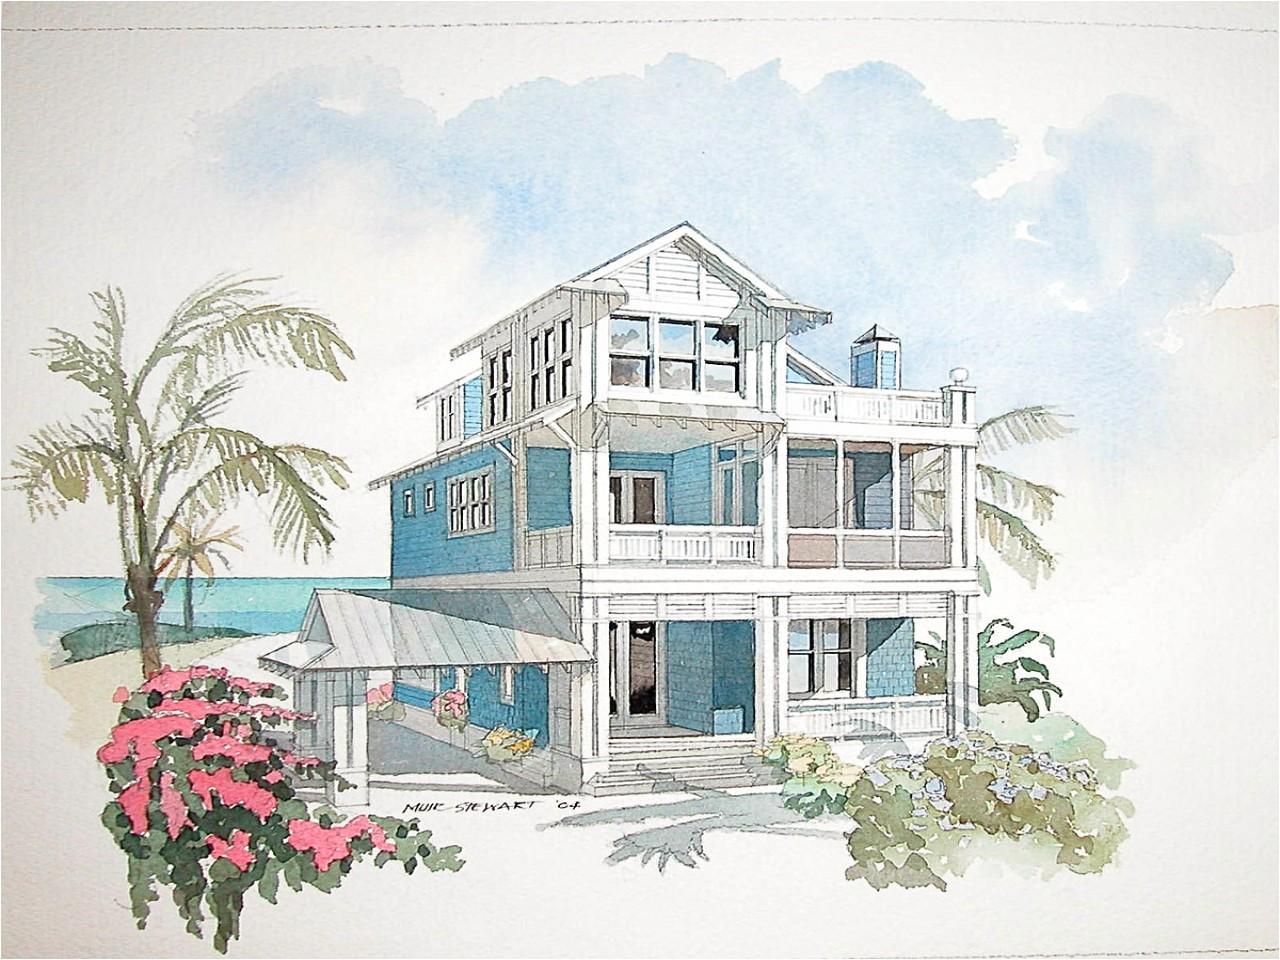 b8ed1bd9e51b0ca0 coastal home design plans beach house plans on pilings